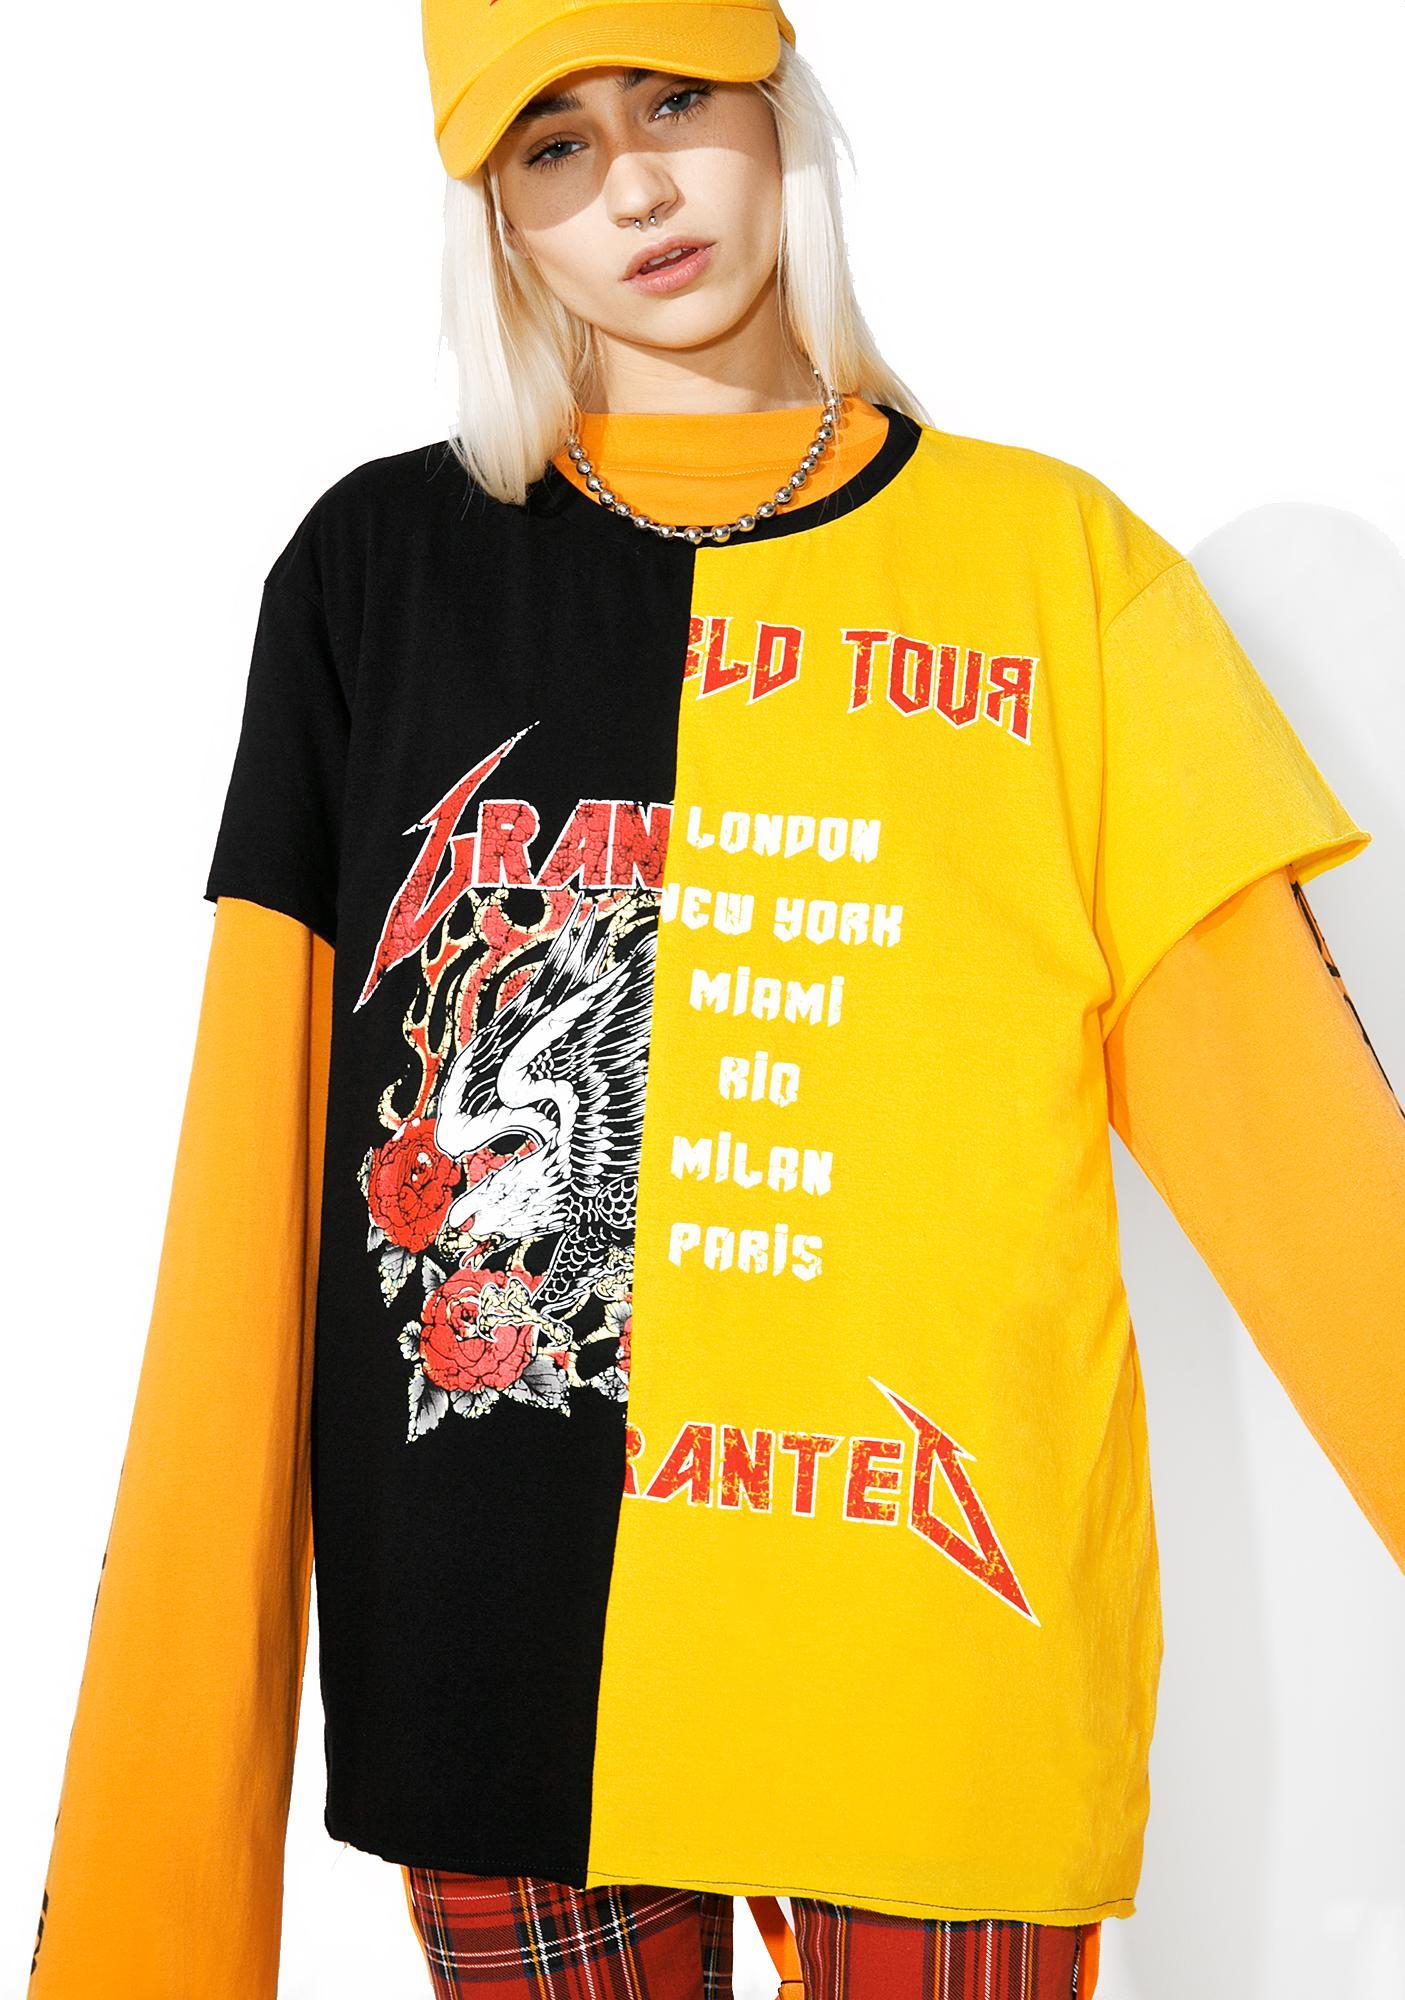 Jaded x Granted Tour Merch Split Graphic Tee